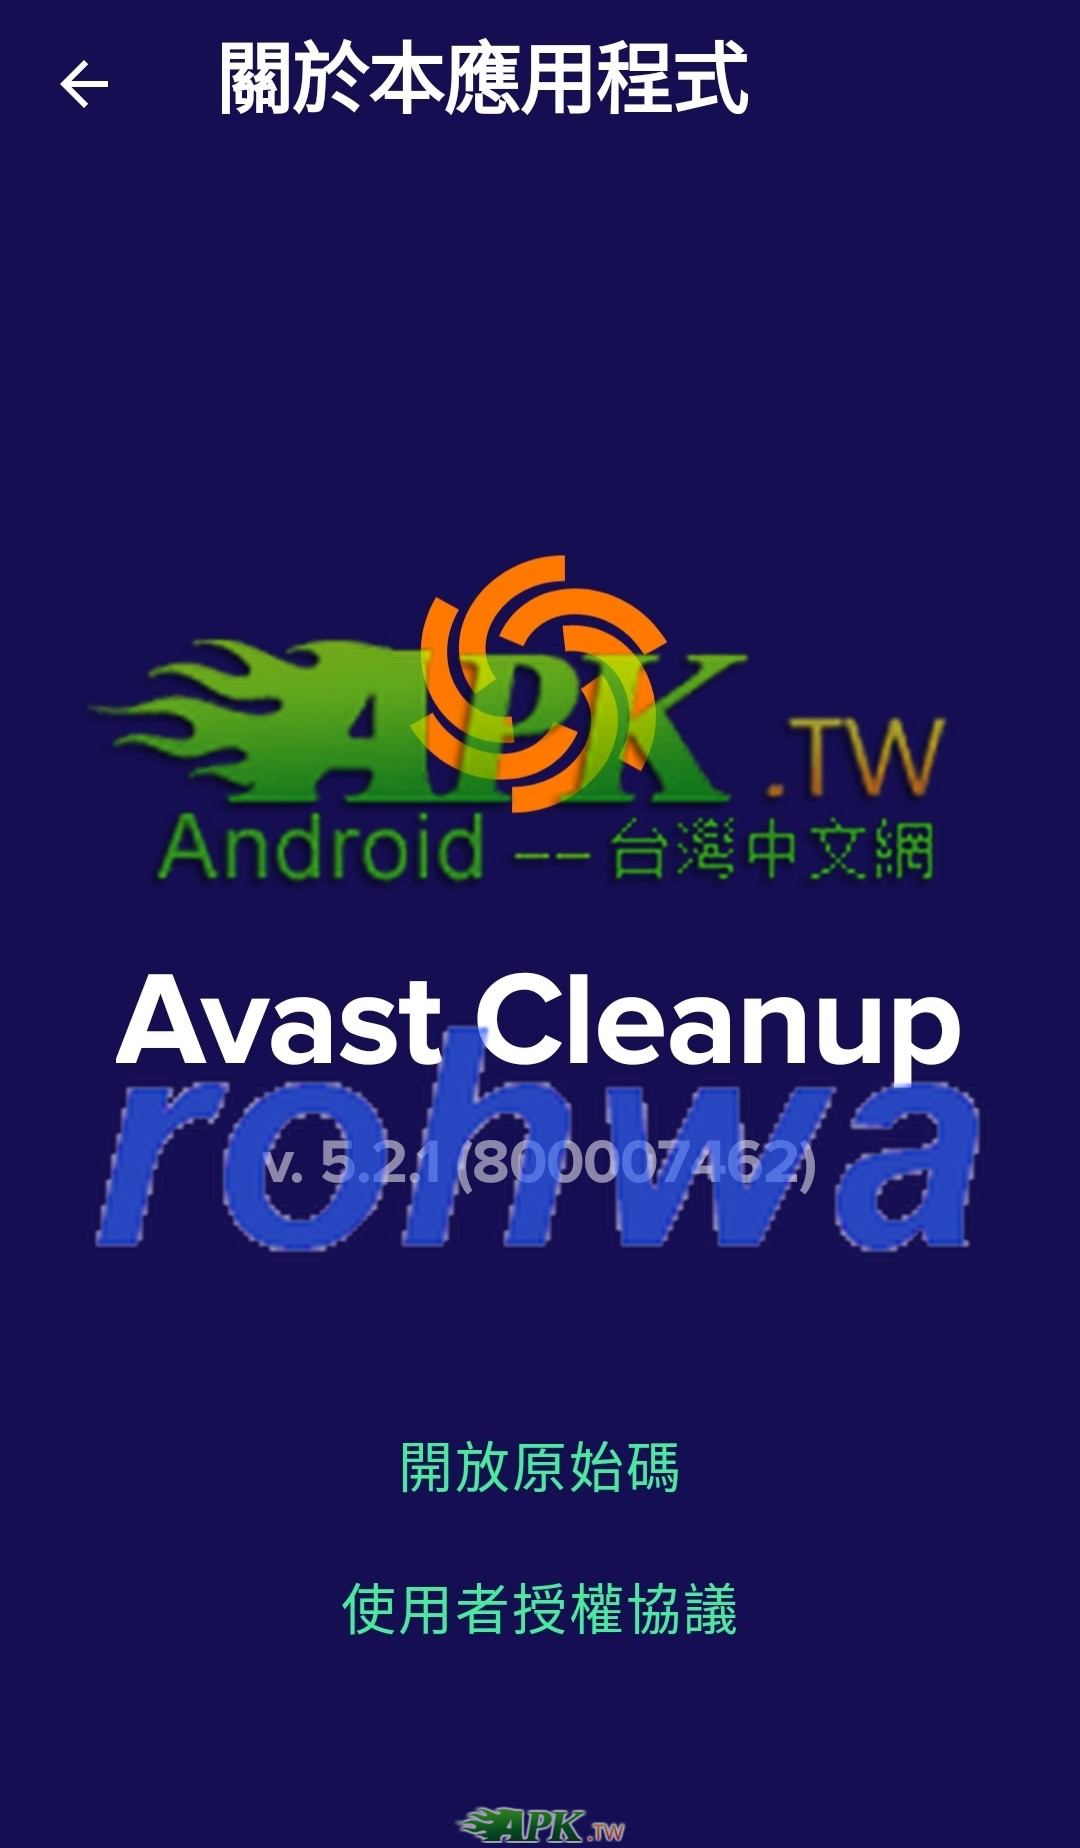 Avast_Cleanup__4__.jpg